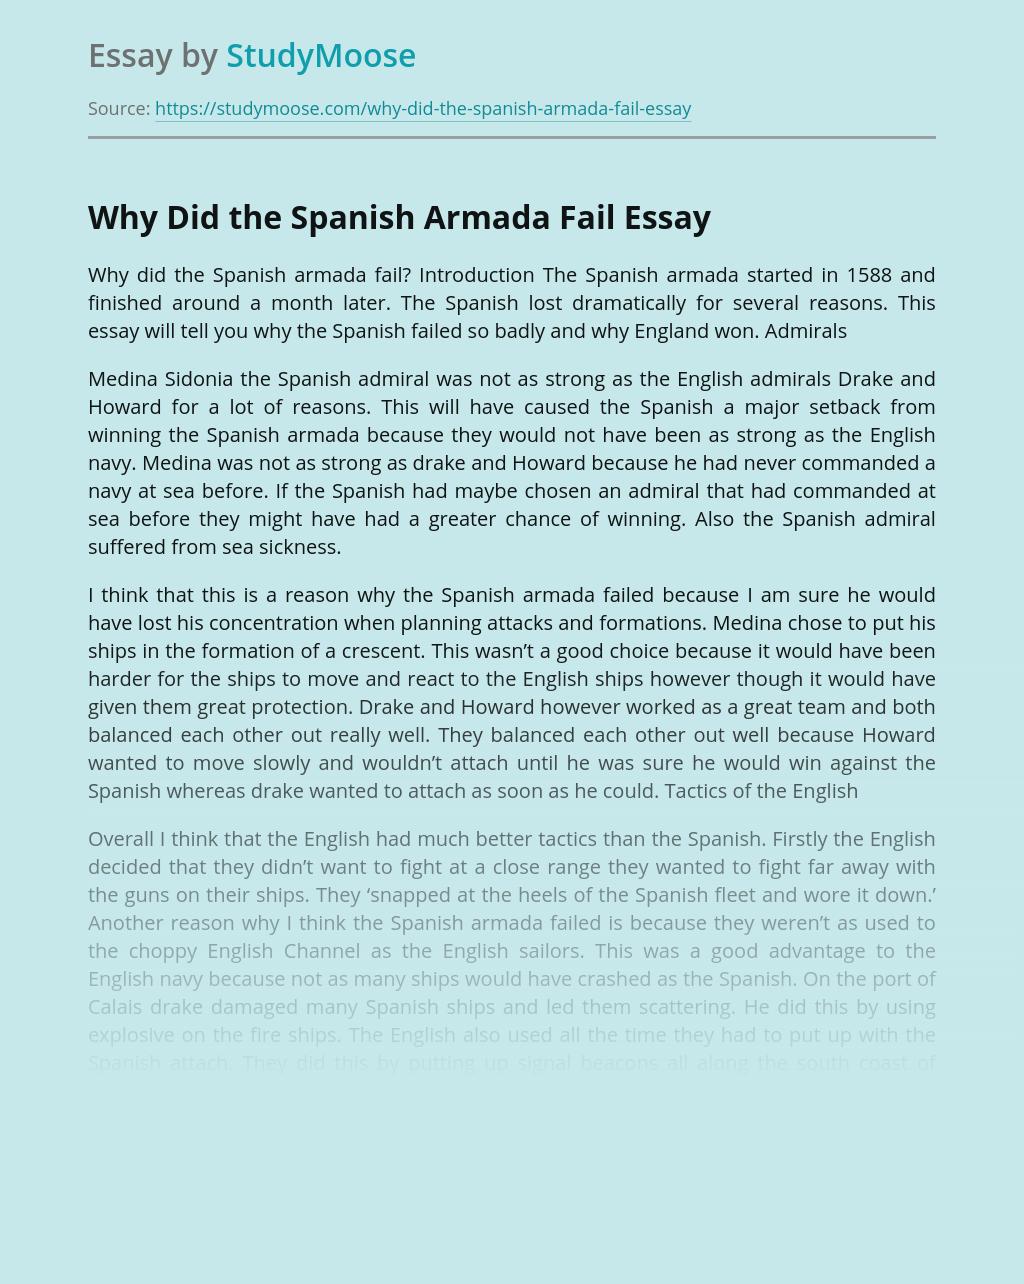 History About Fail of Spanish Armada